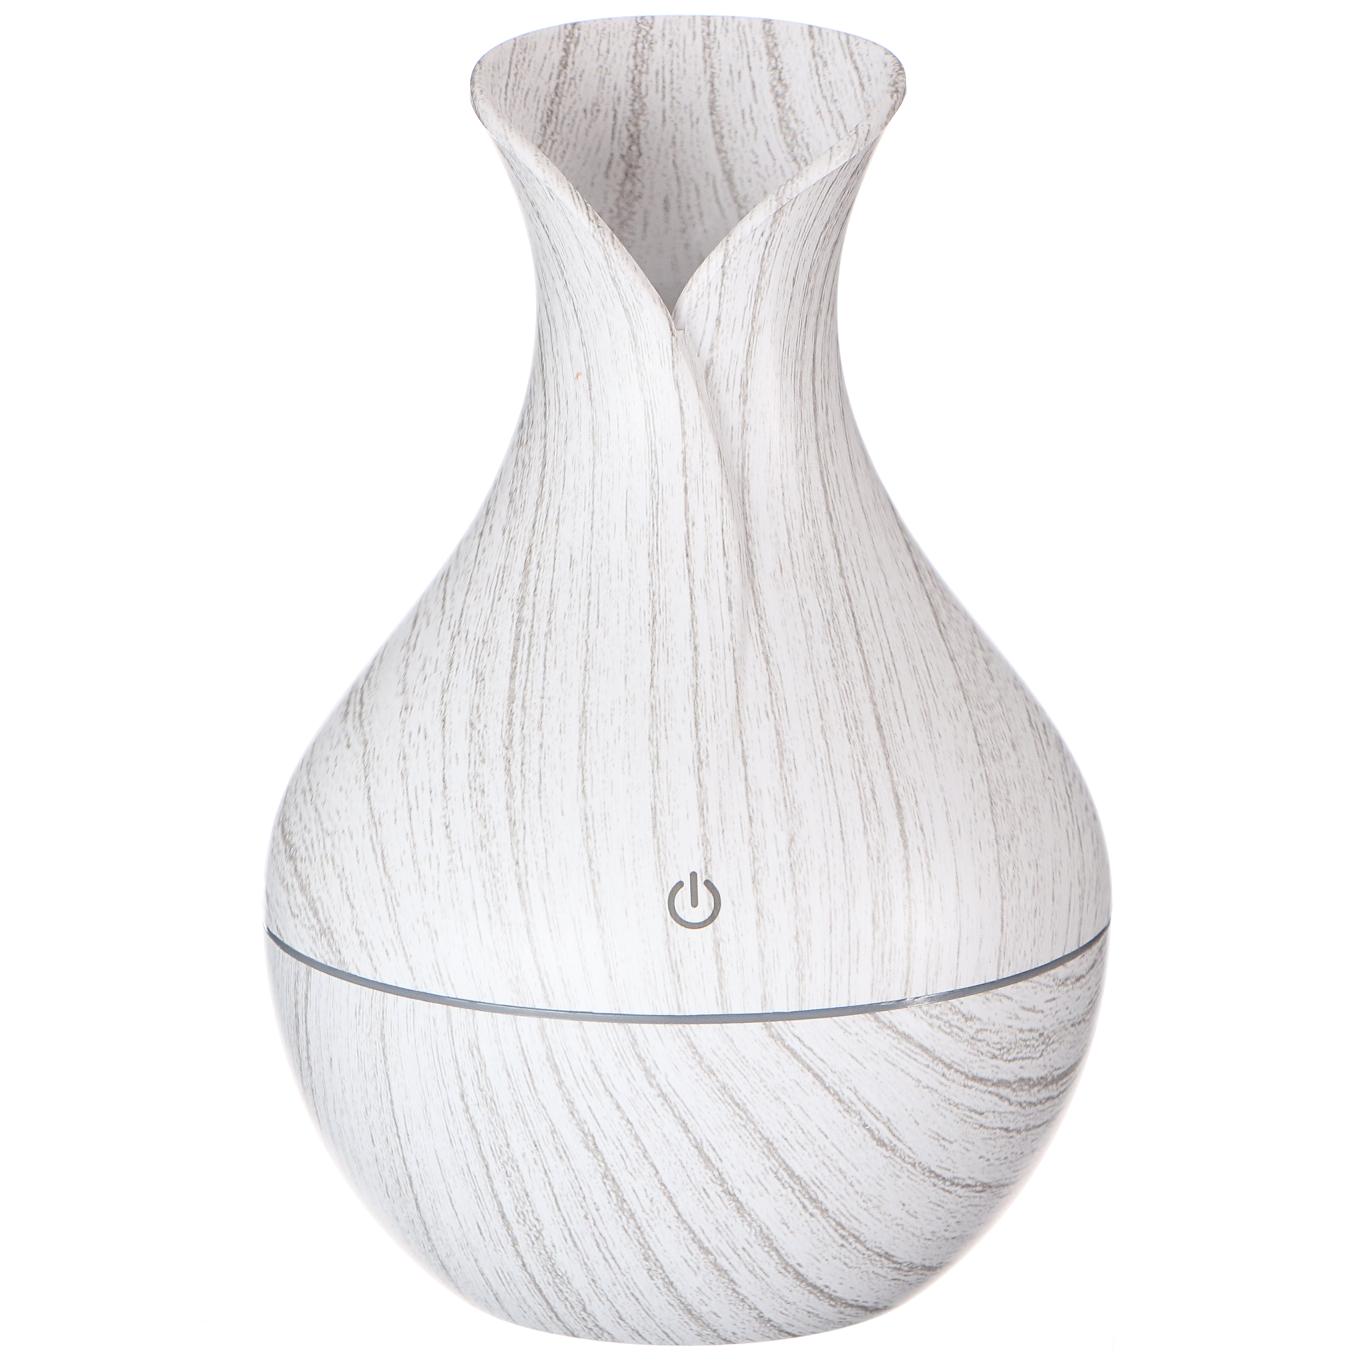 Aroma difuzer Flower bílé dřevo 130ml SIXTOL